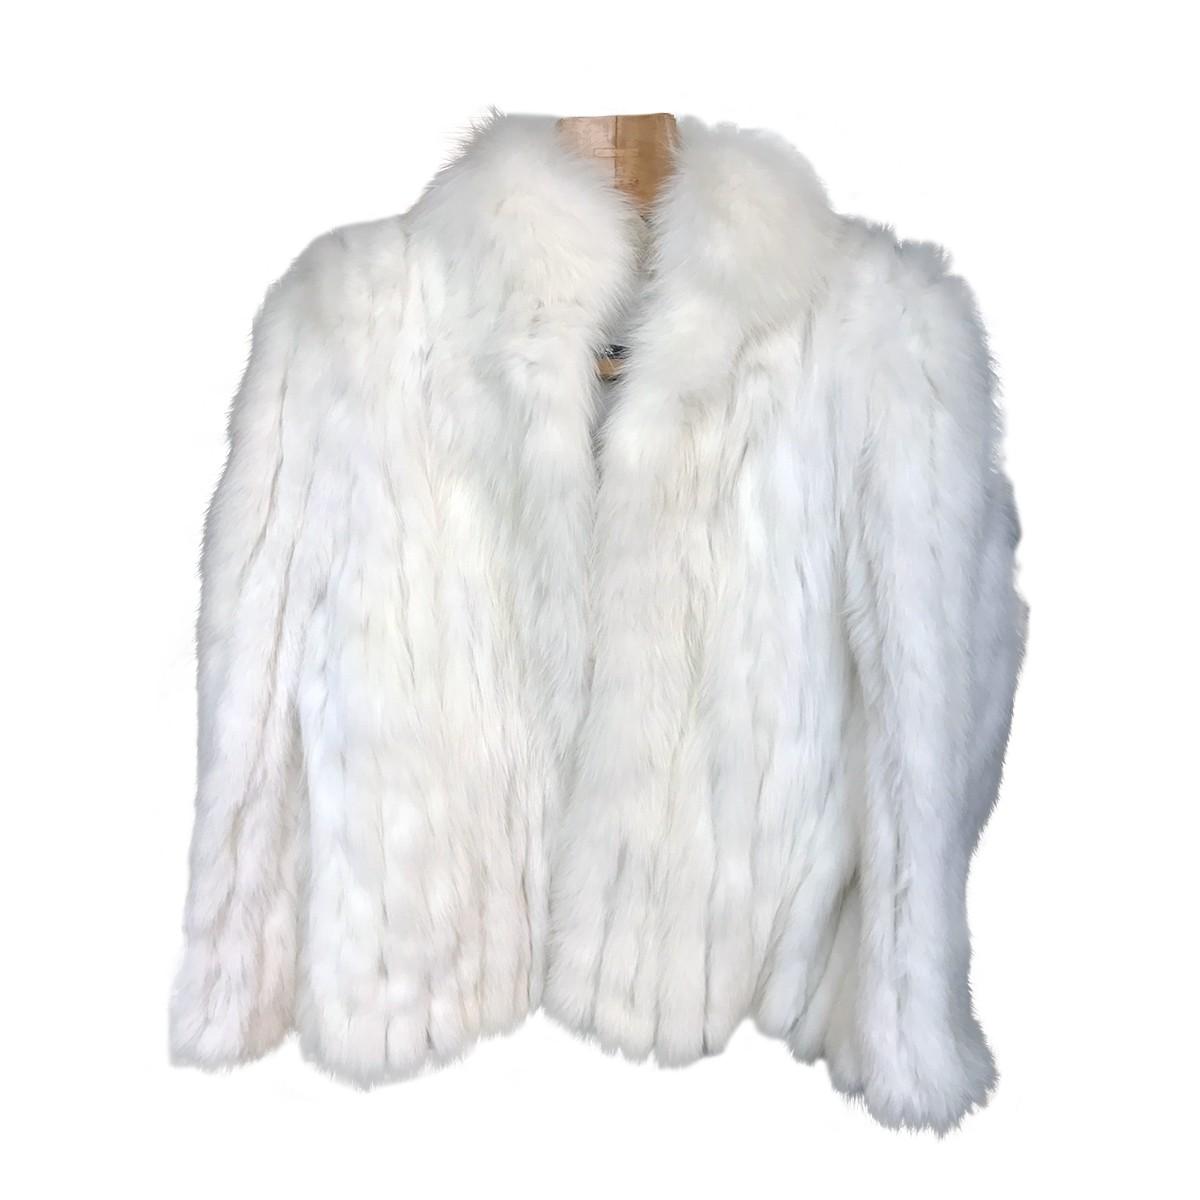 507635734f800 Renar Off white fur coat - coats - clothing - Women